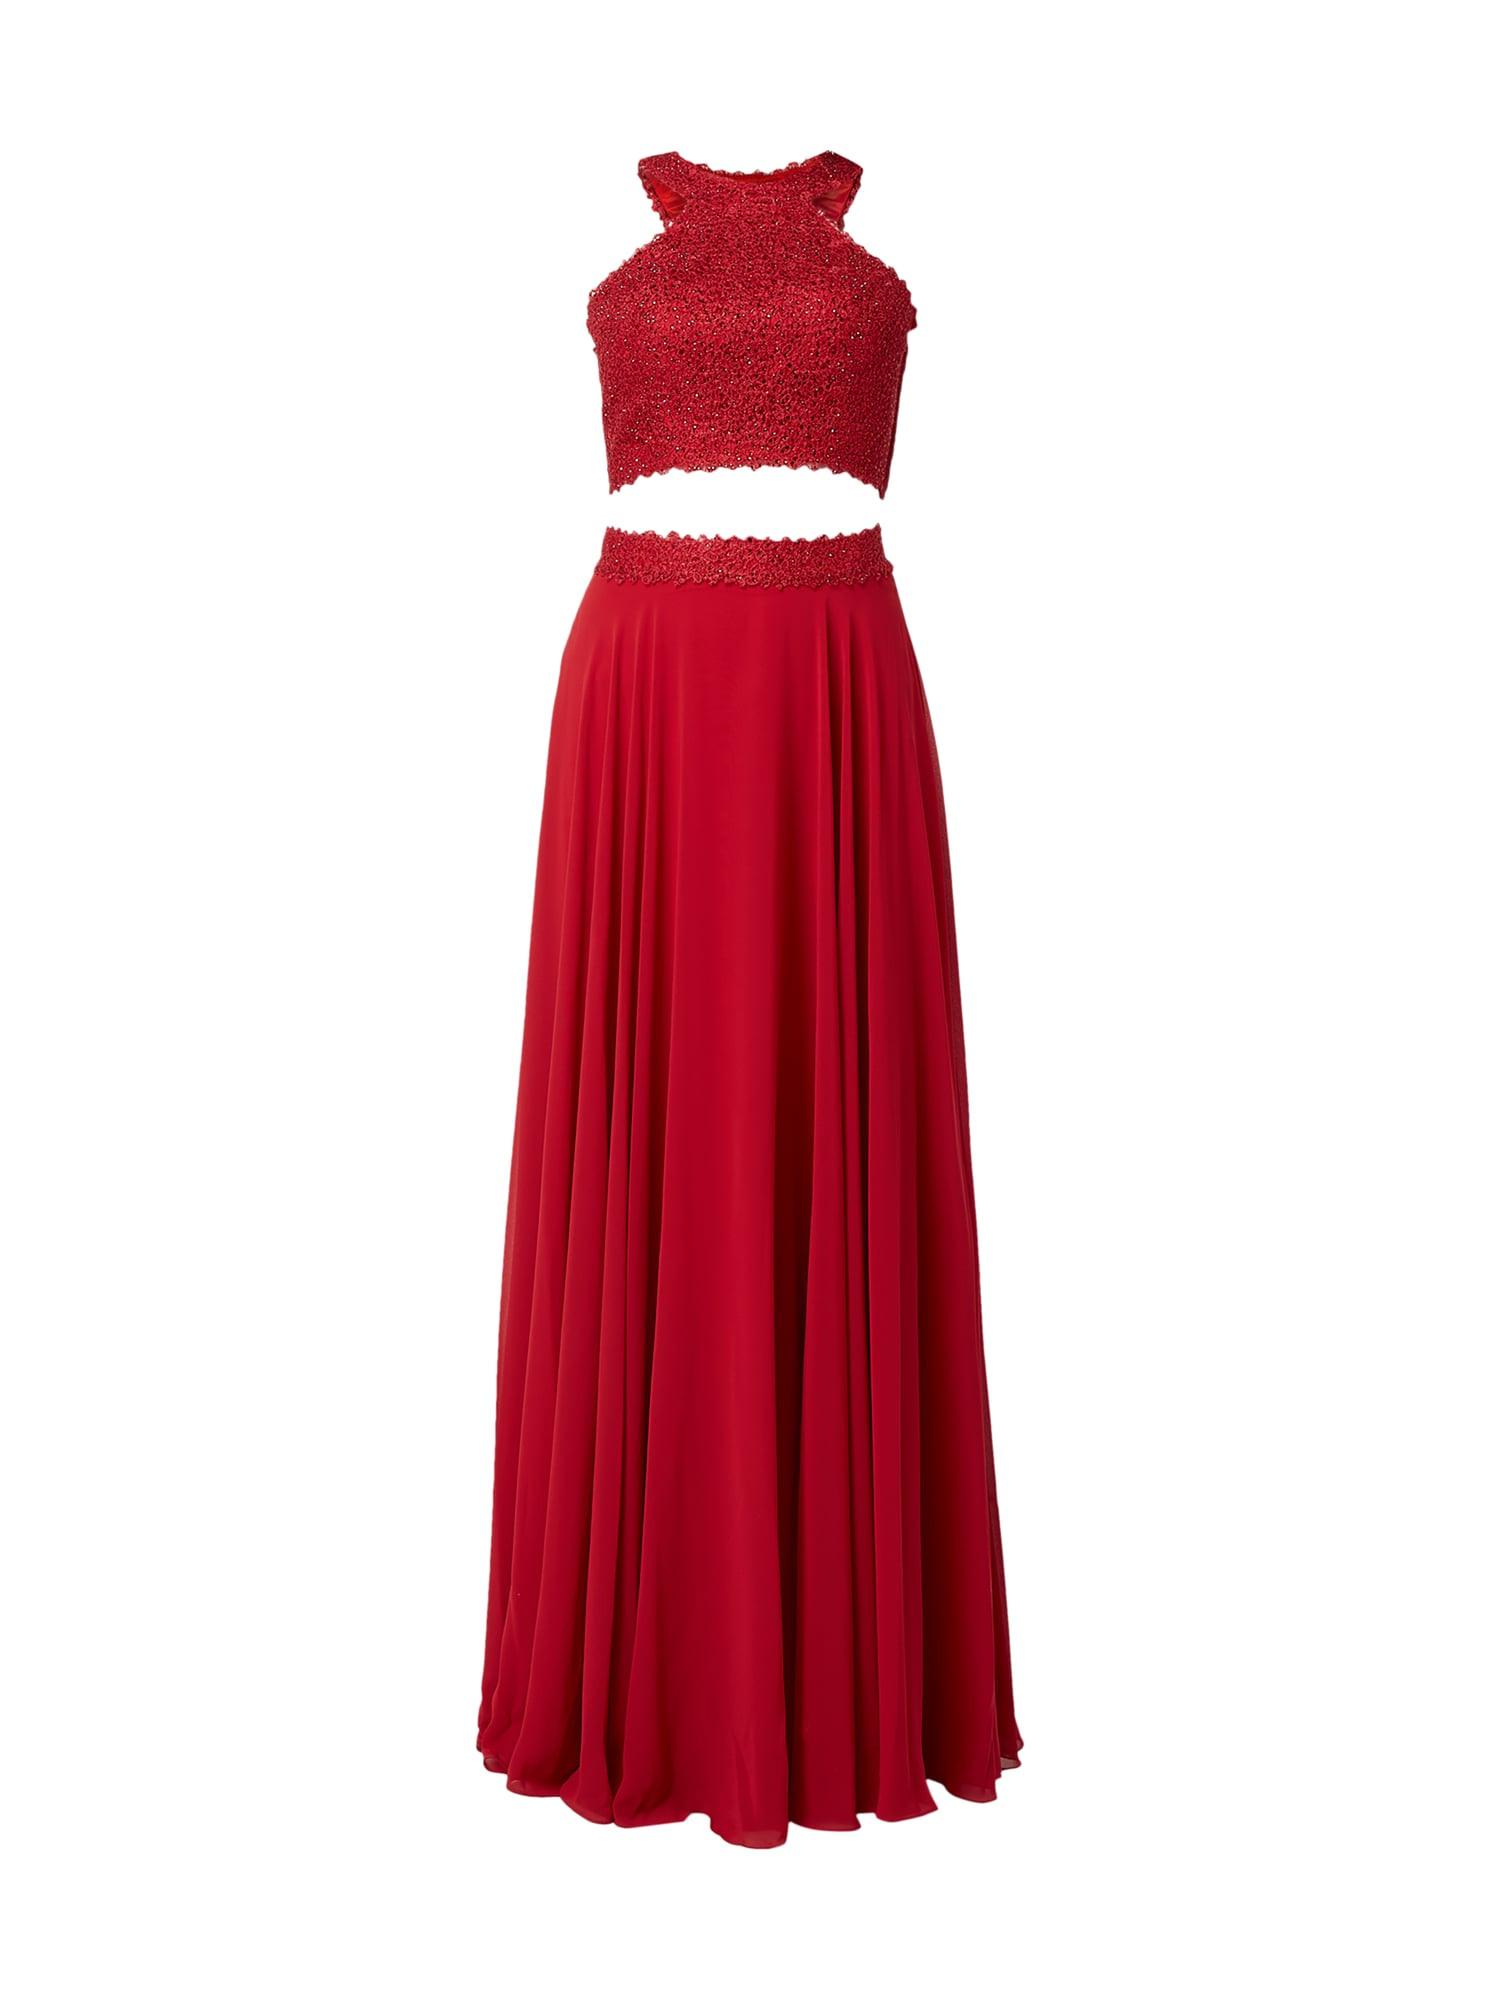 Formal Großartig Two Piece Abendkleid Ärmel17 Einzigartig Two Piece Abendkleid Design